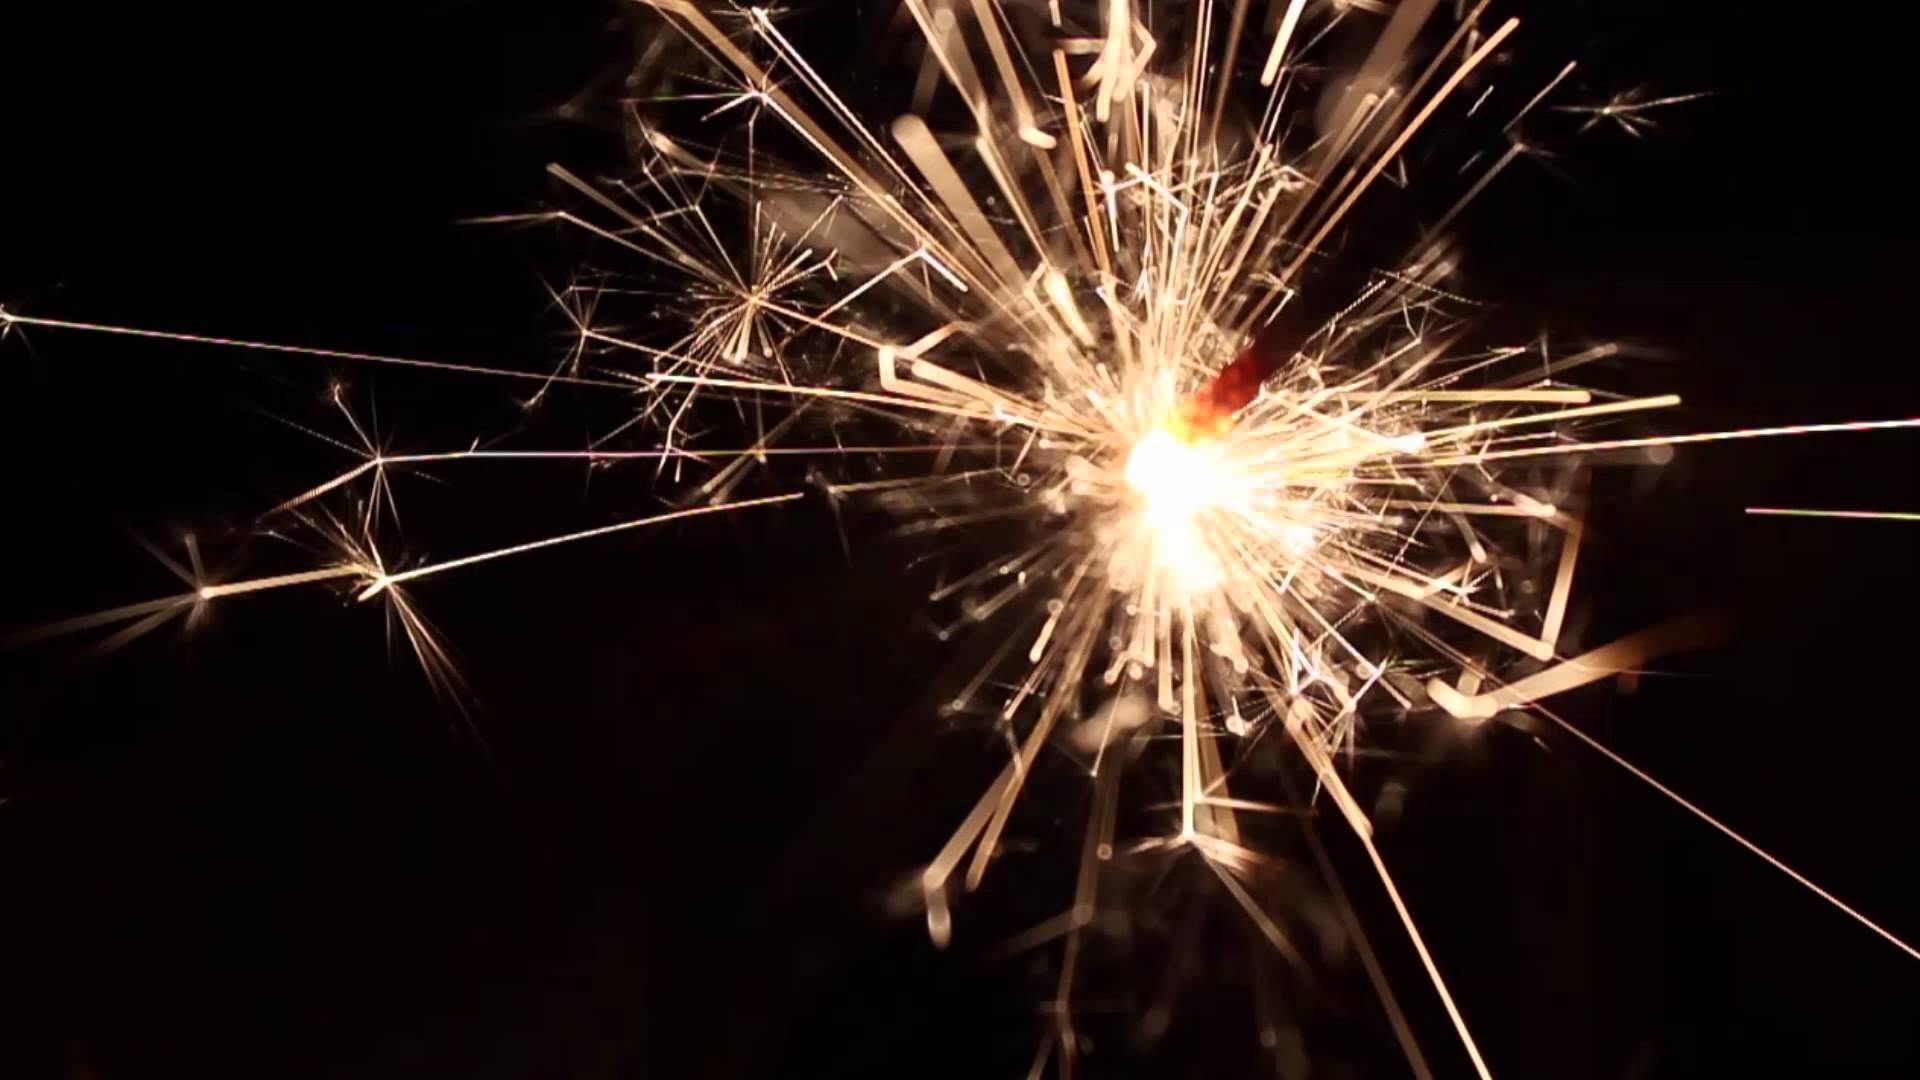 Burning Bengal Lights Sparkler 15 - free HD vfx - YouTube